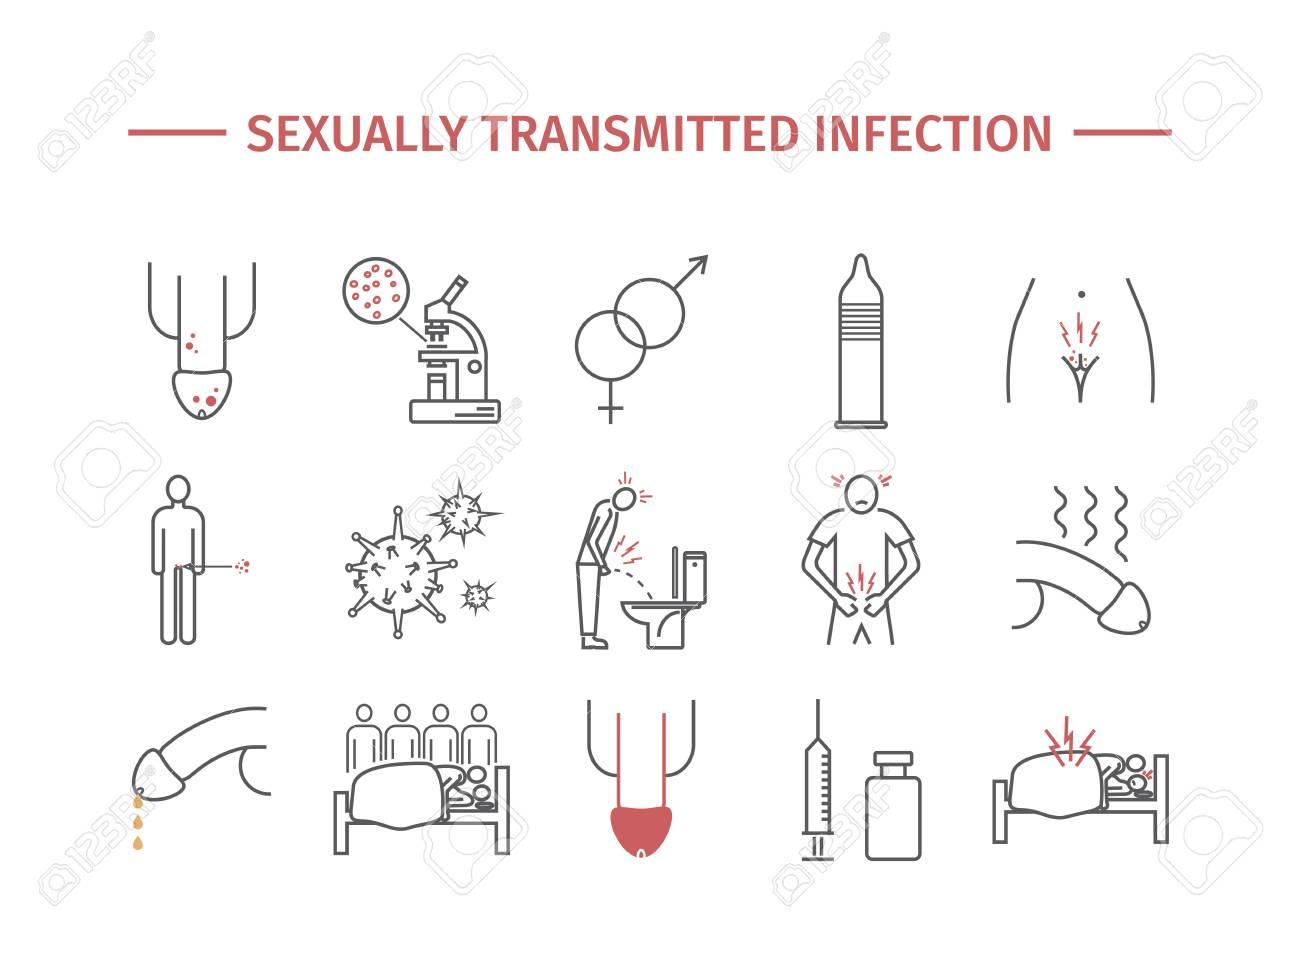 Hasidic sexuality sheet